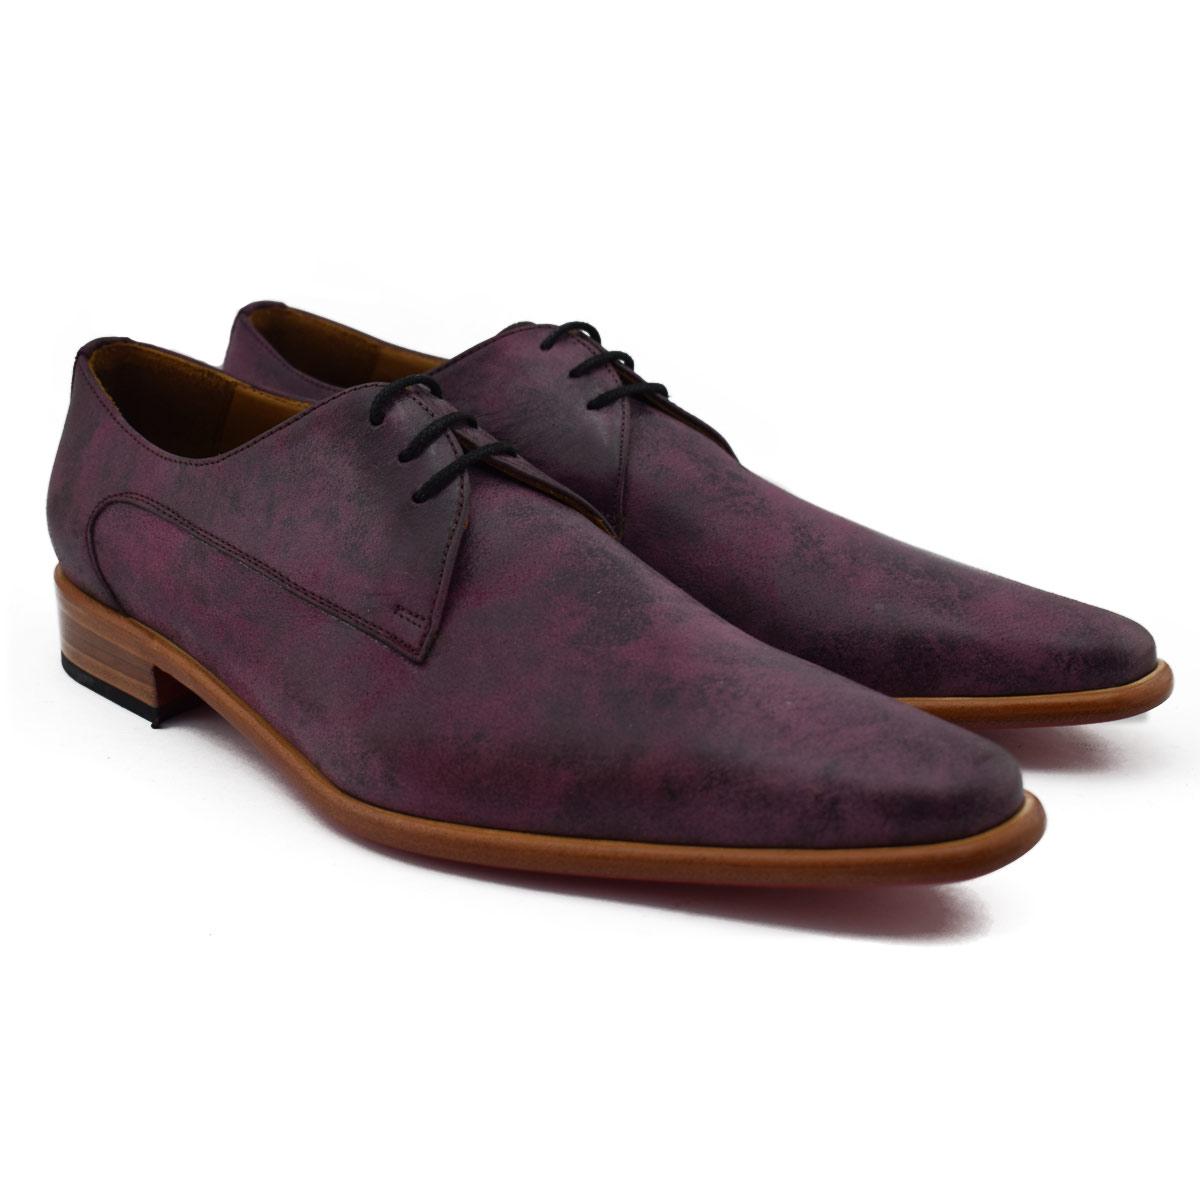 50a638bd52 Zapato de vestir T-13011-F